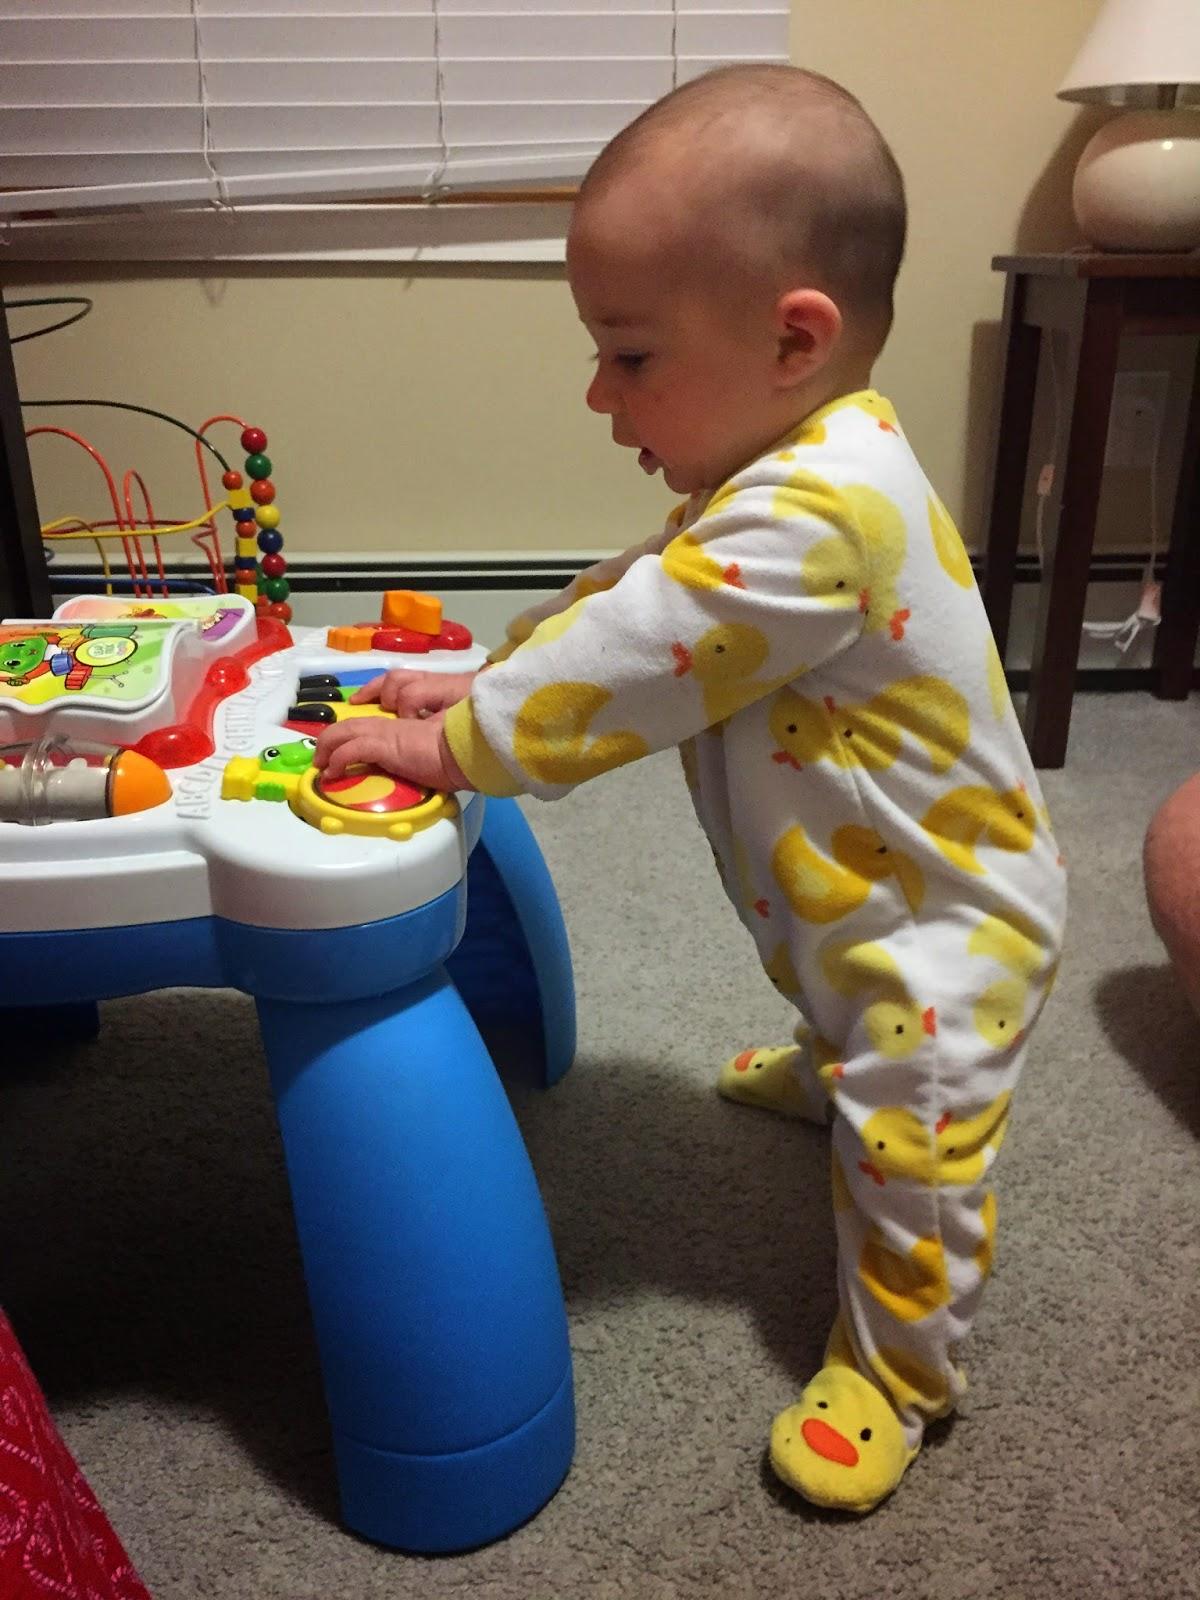 baby standing